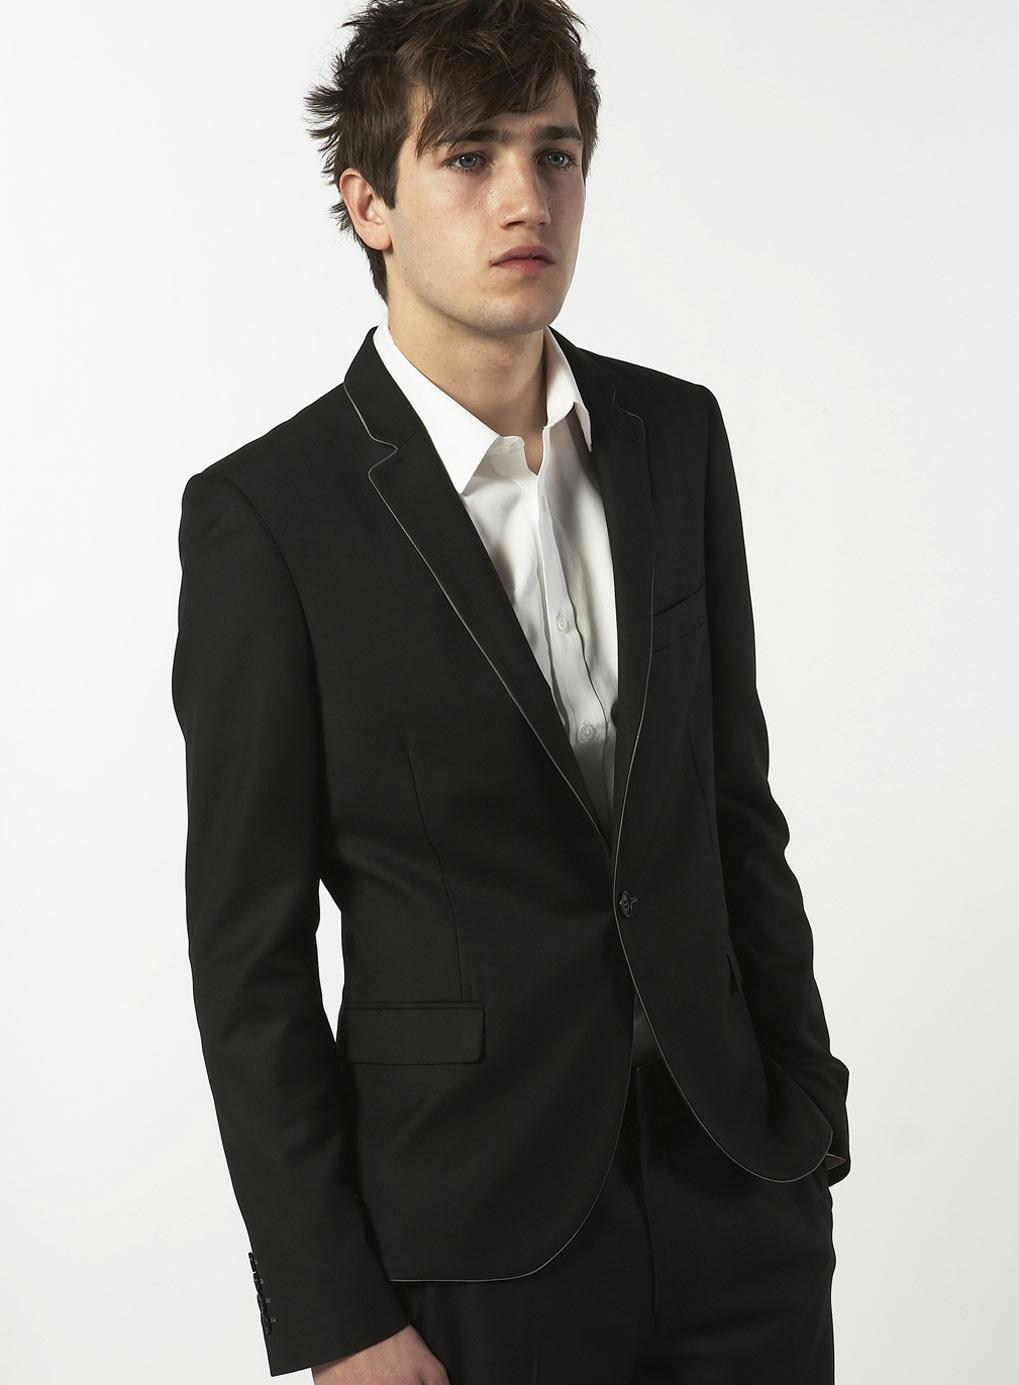 For Men Dress To Impress  Stylertcom  gaby schmid  PRLog